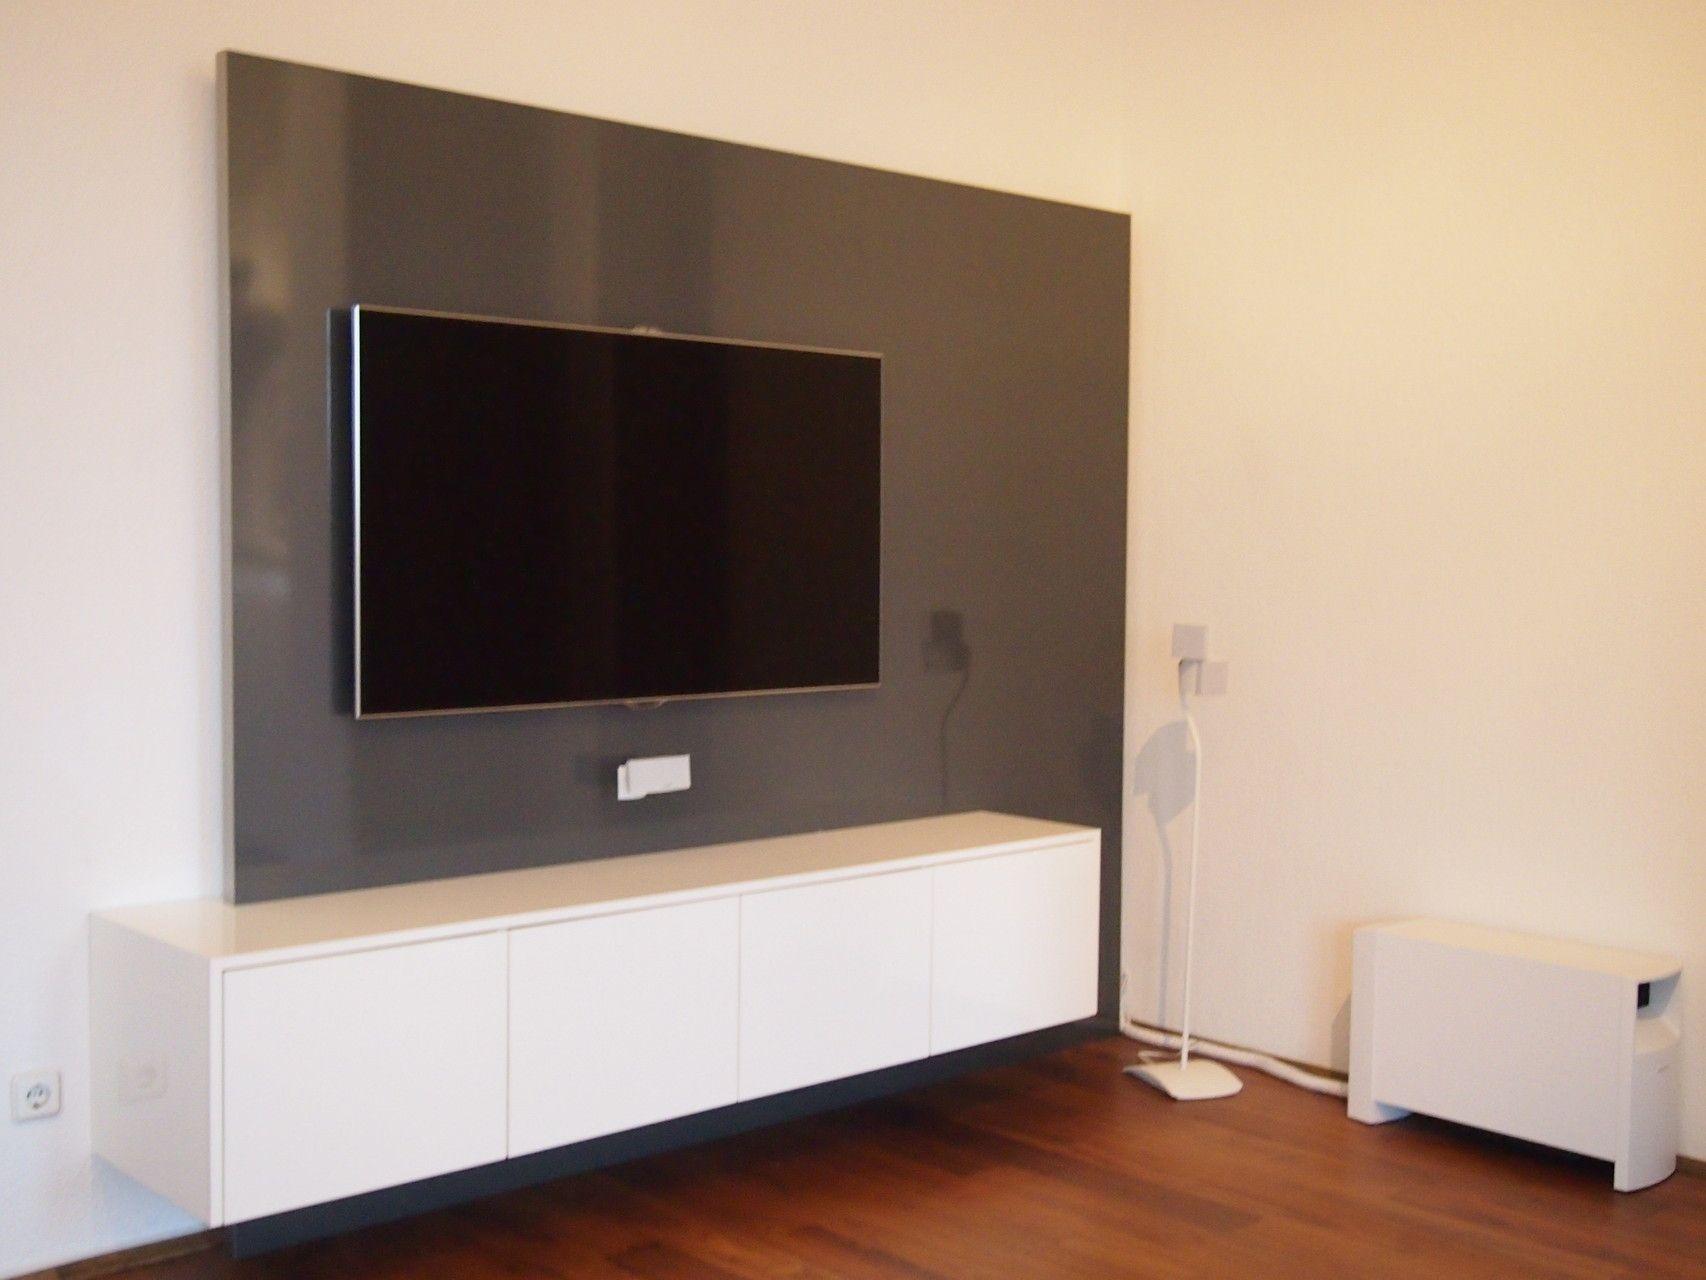 kabelkanal wand tv Referenzen - TV WALL TV Wand | Fernsehwand aus Schreinerhand Tv Kabelkanal,  Wohnzimmer Tv,